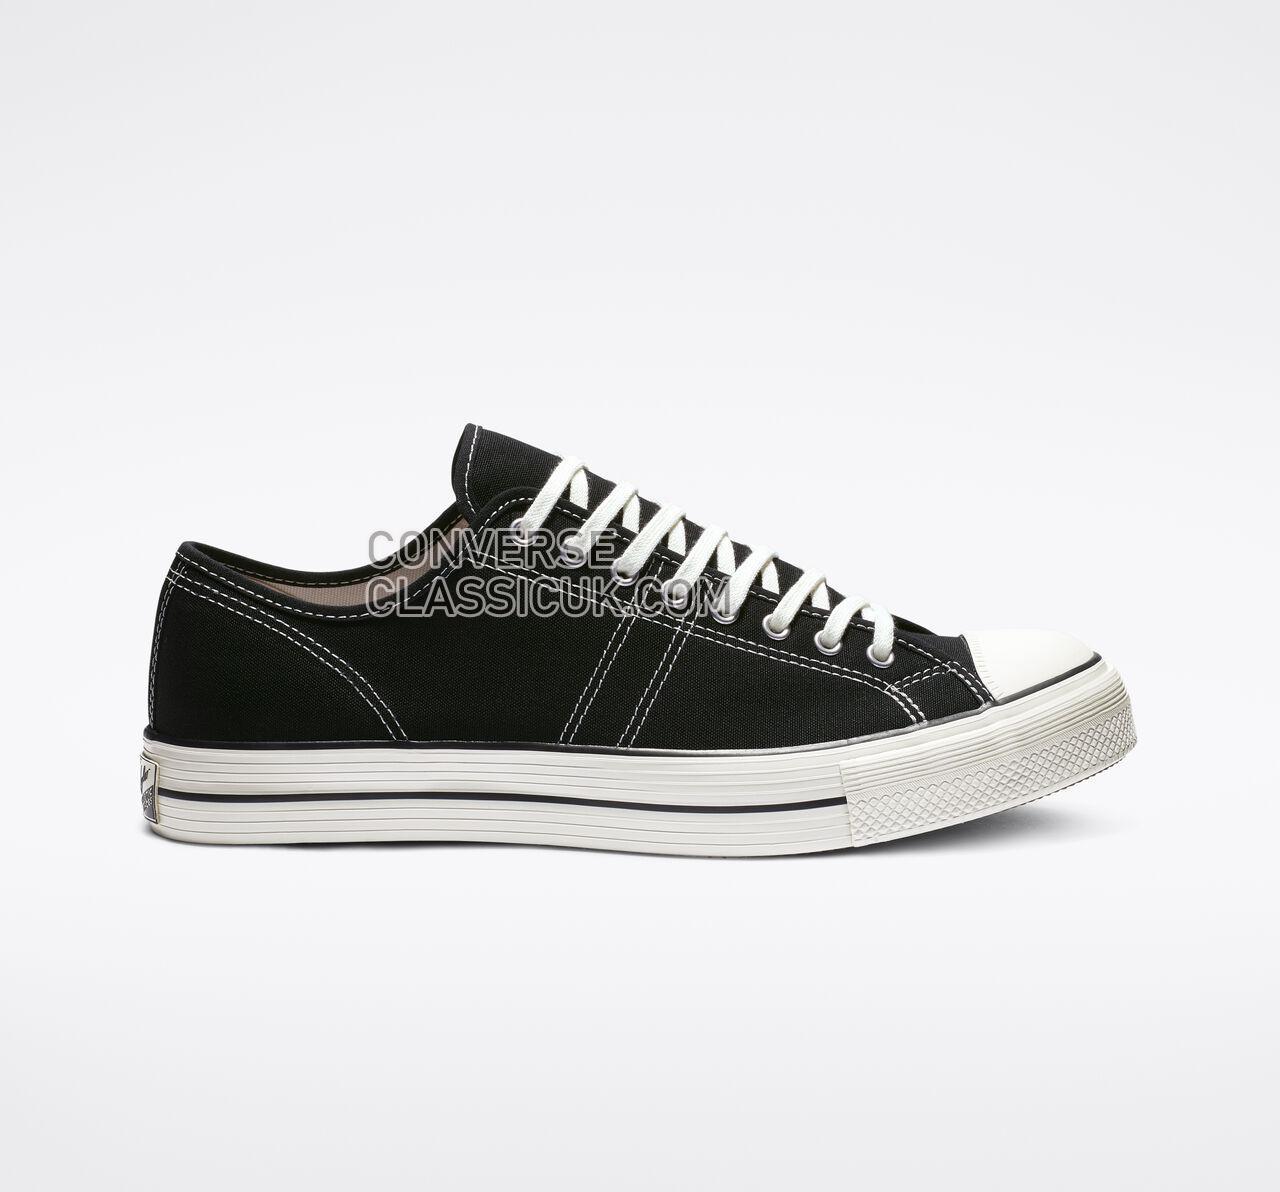 Converse Lucky Star Low Top Mens Womens Unisex 163159C Black/Black/Egret Shoes